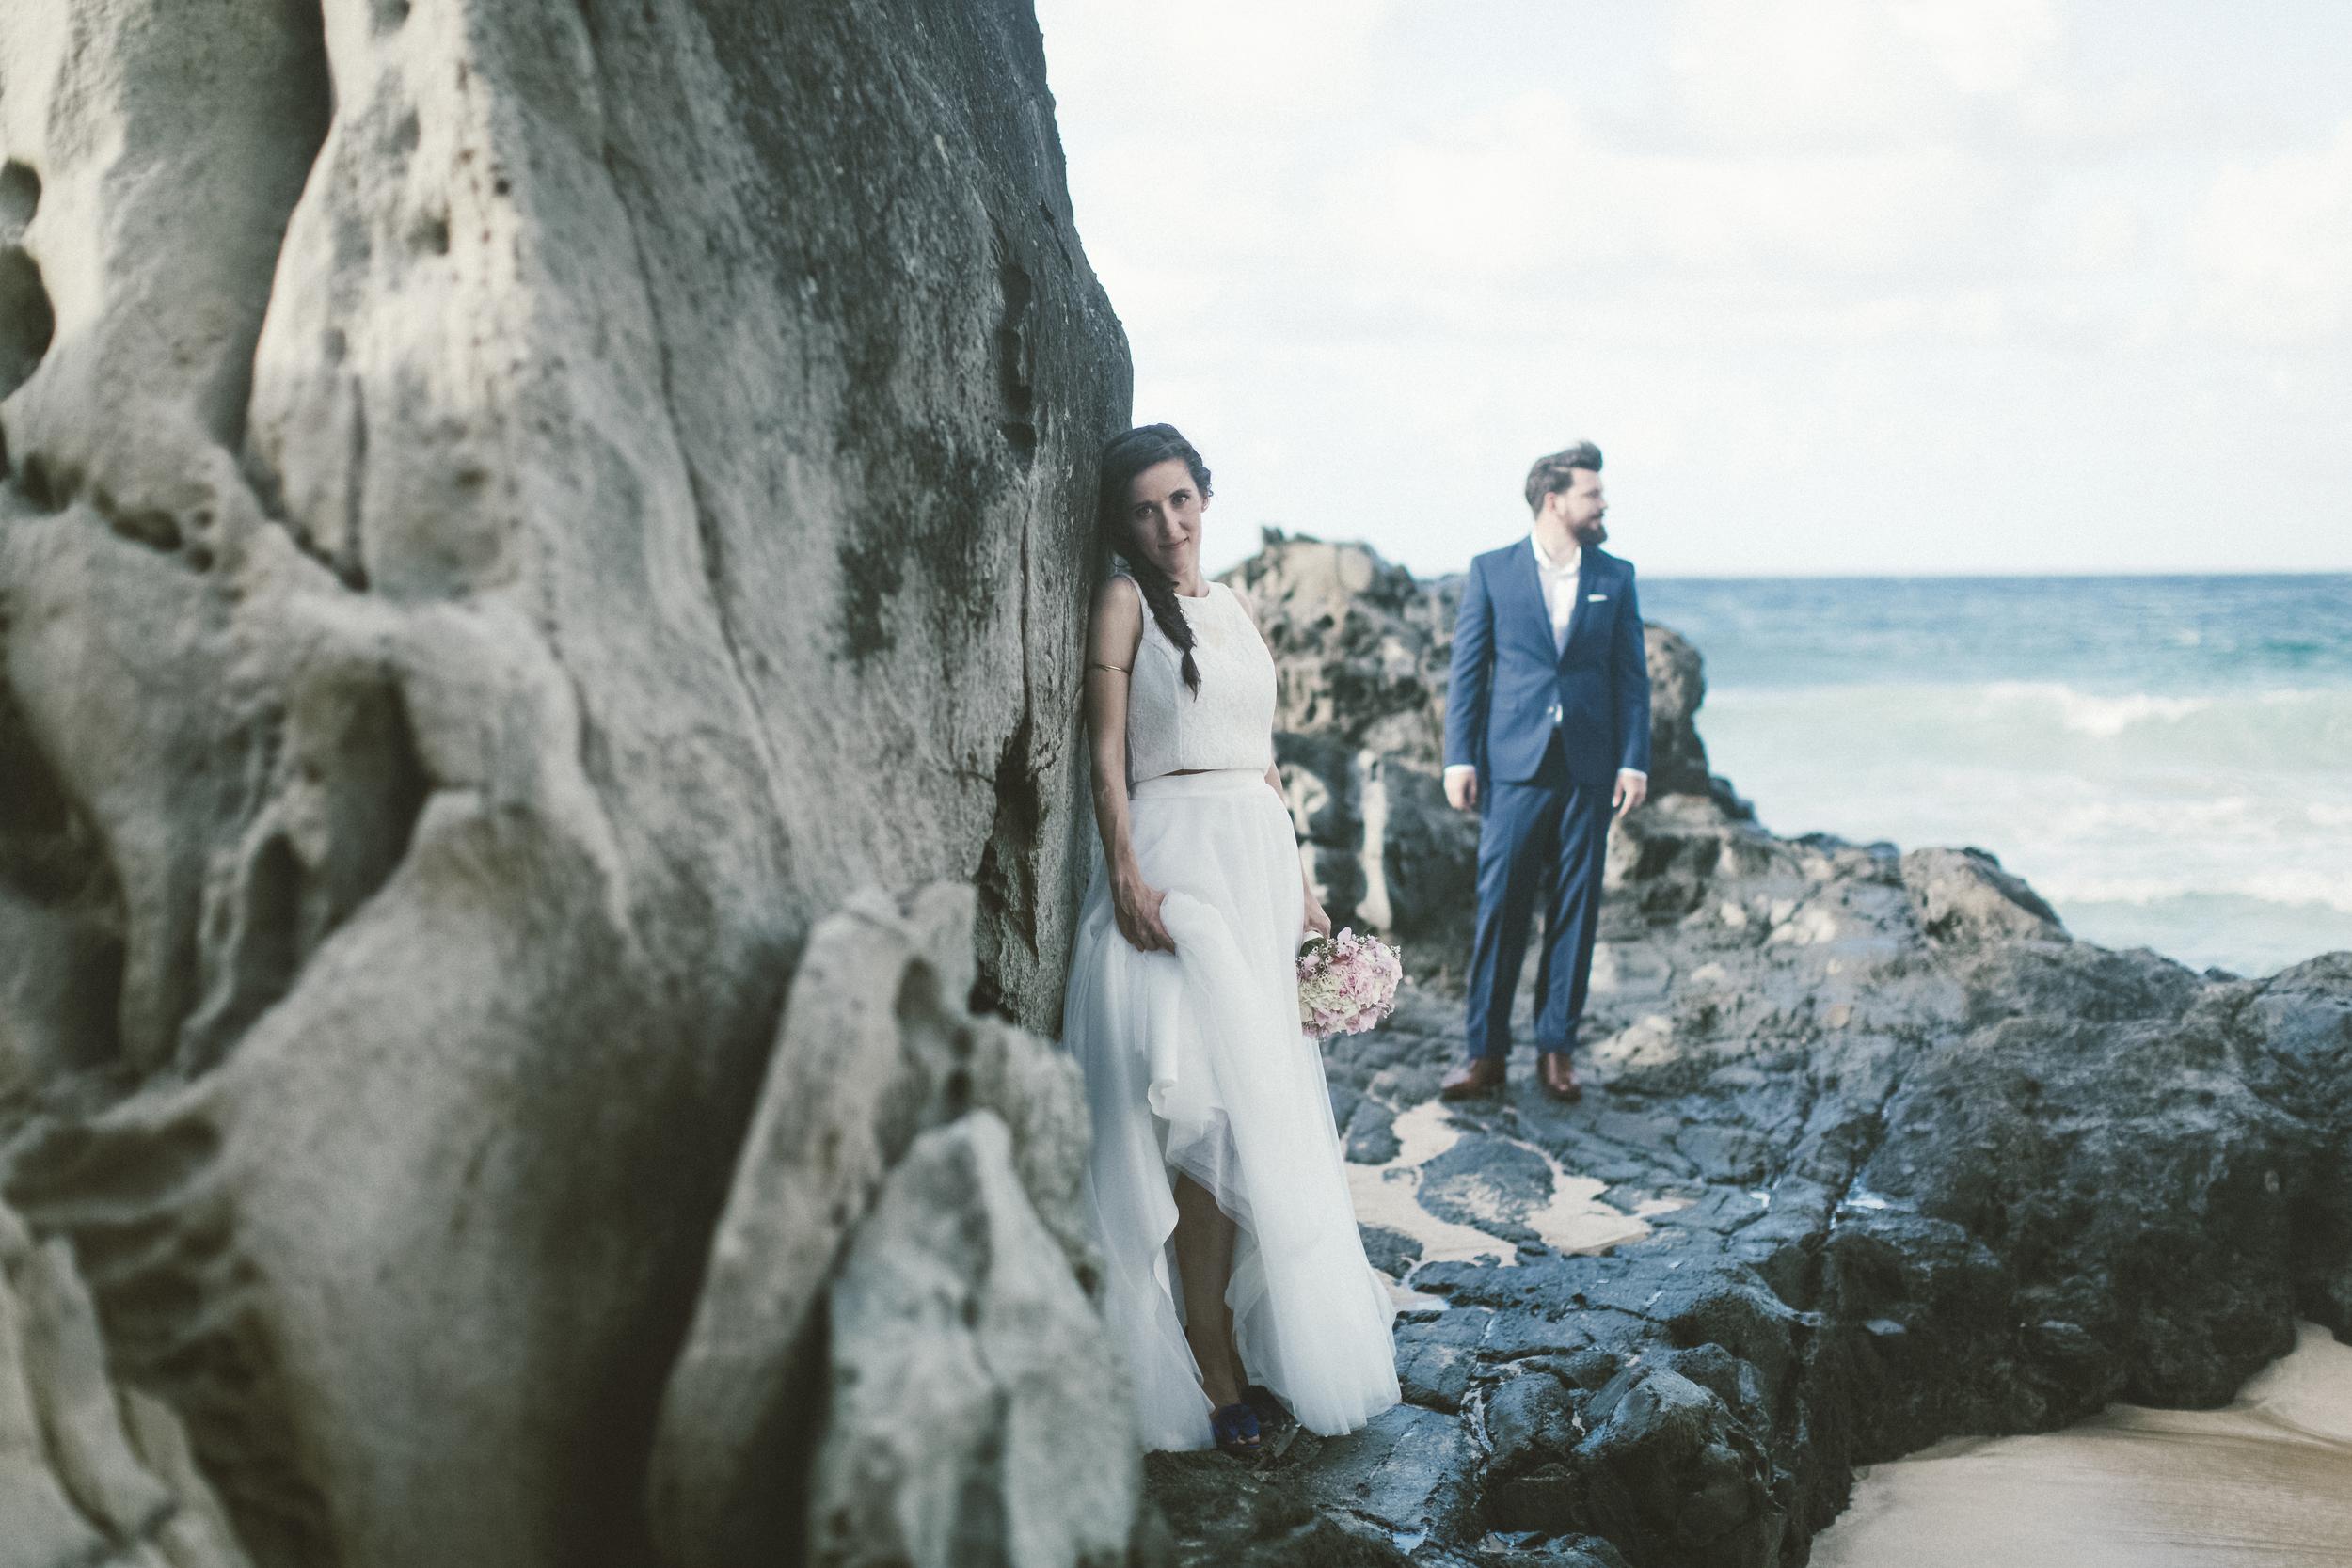 angie-diaz-photography-maui-wedding-ironwoods-beach-42.jpg